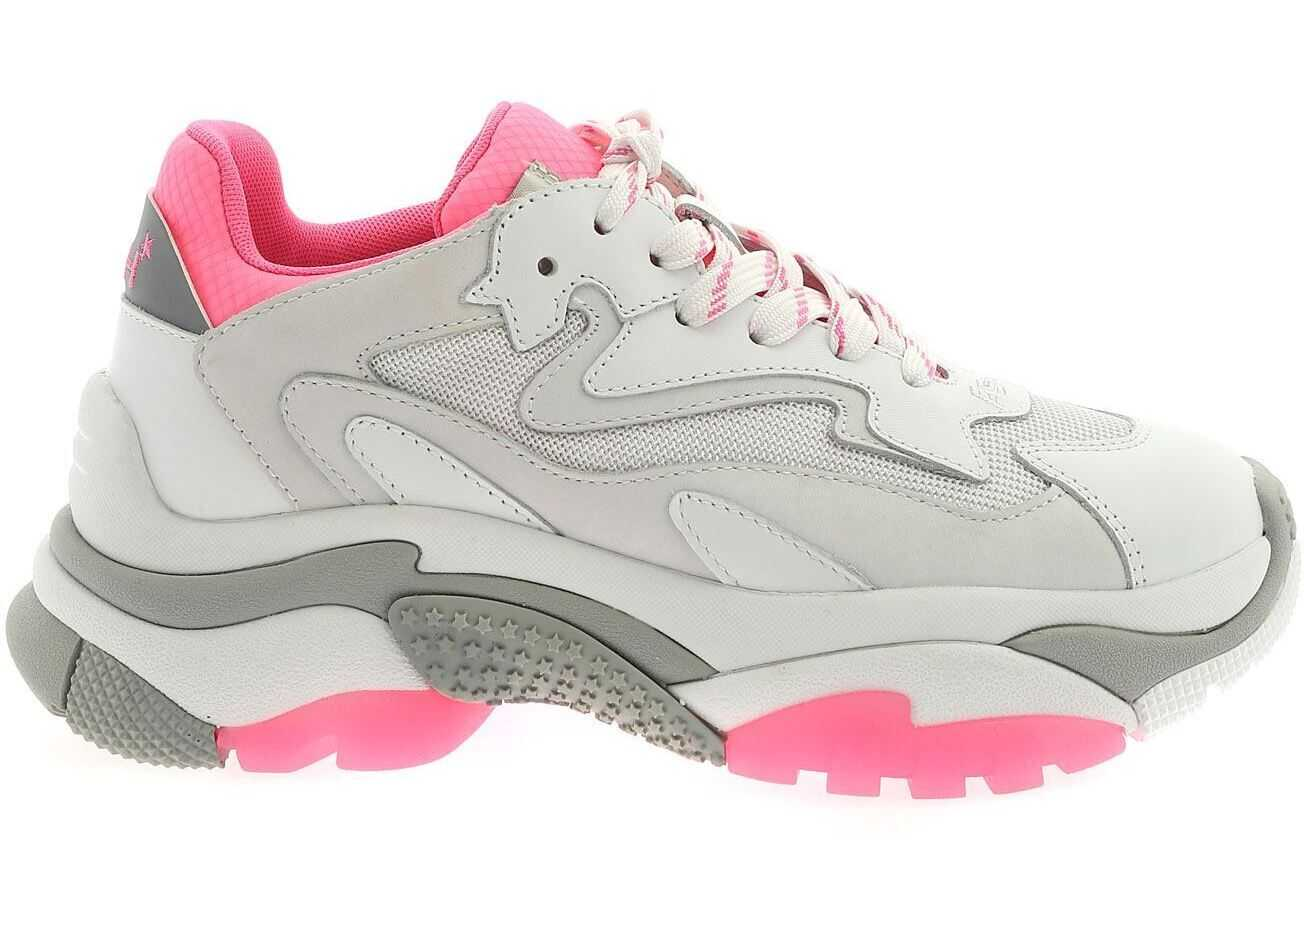 ASH Addict Sneakers In White And Fuchsia White